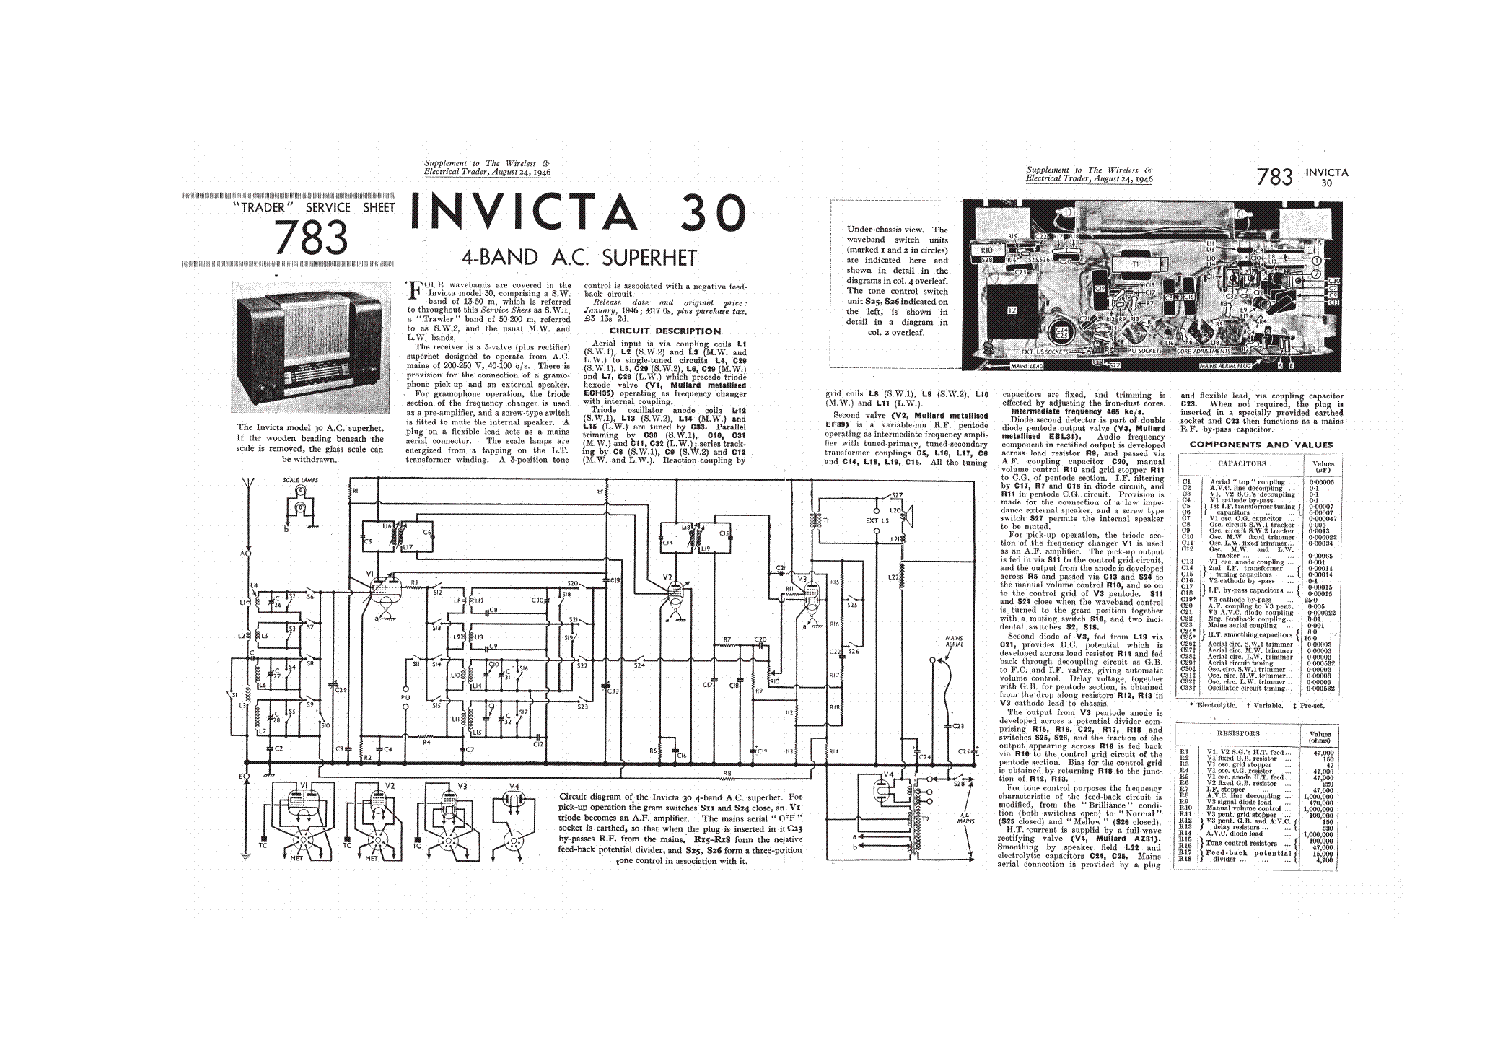 Invicta 30 Am Radio Receiver Service Manual Download Schematics Circuit 1st Page